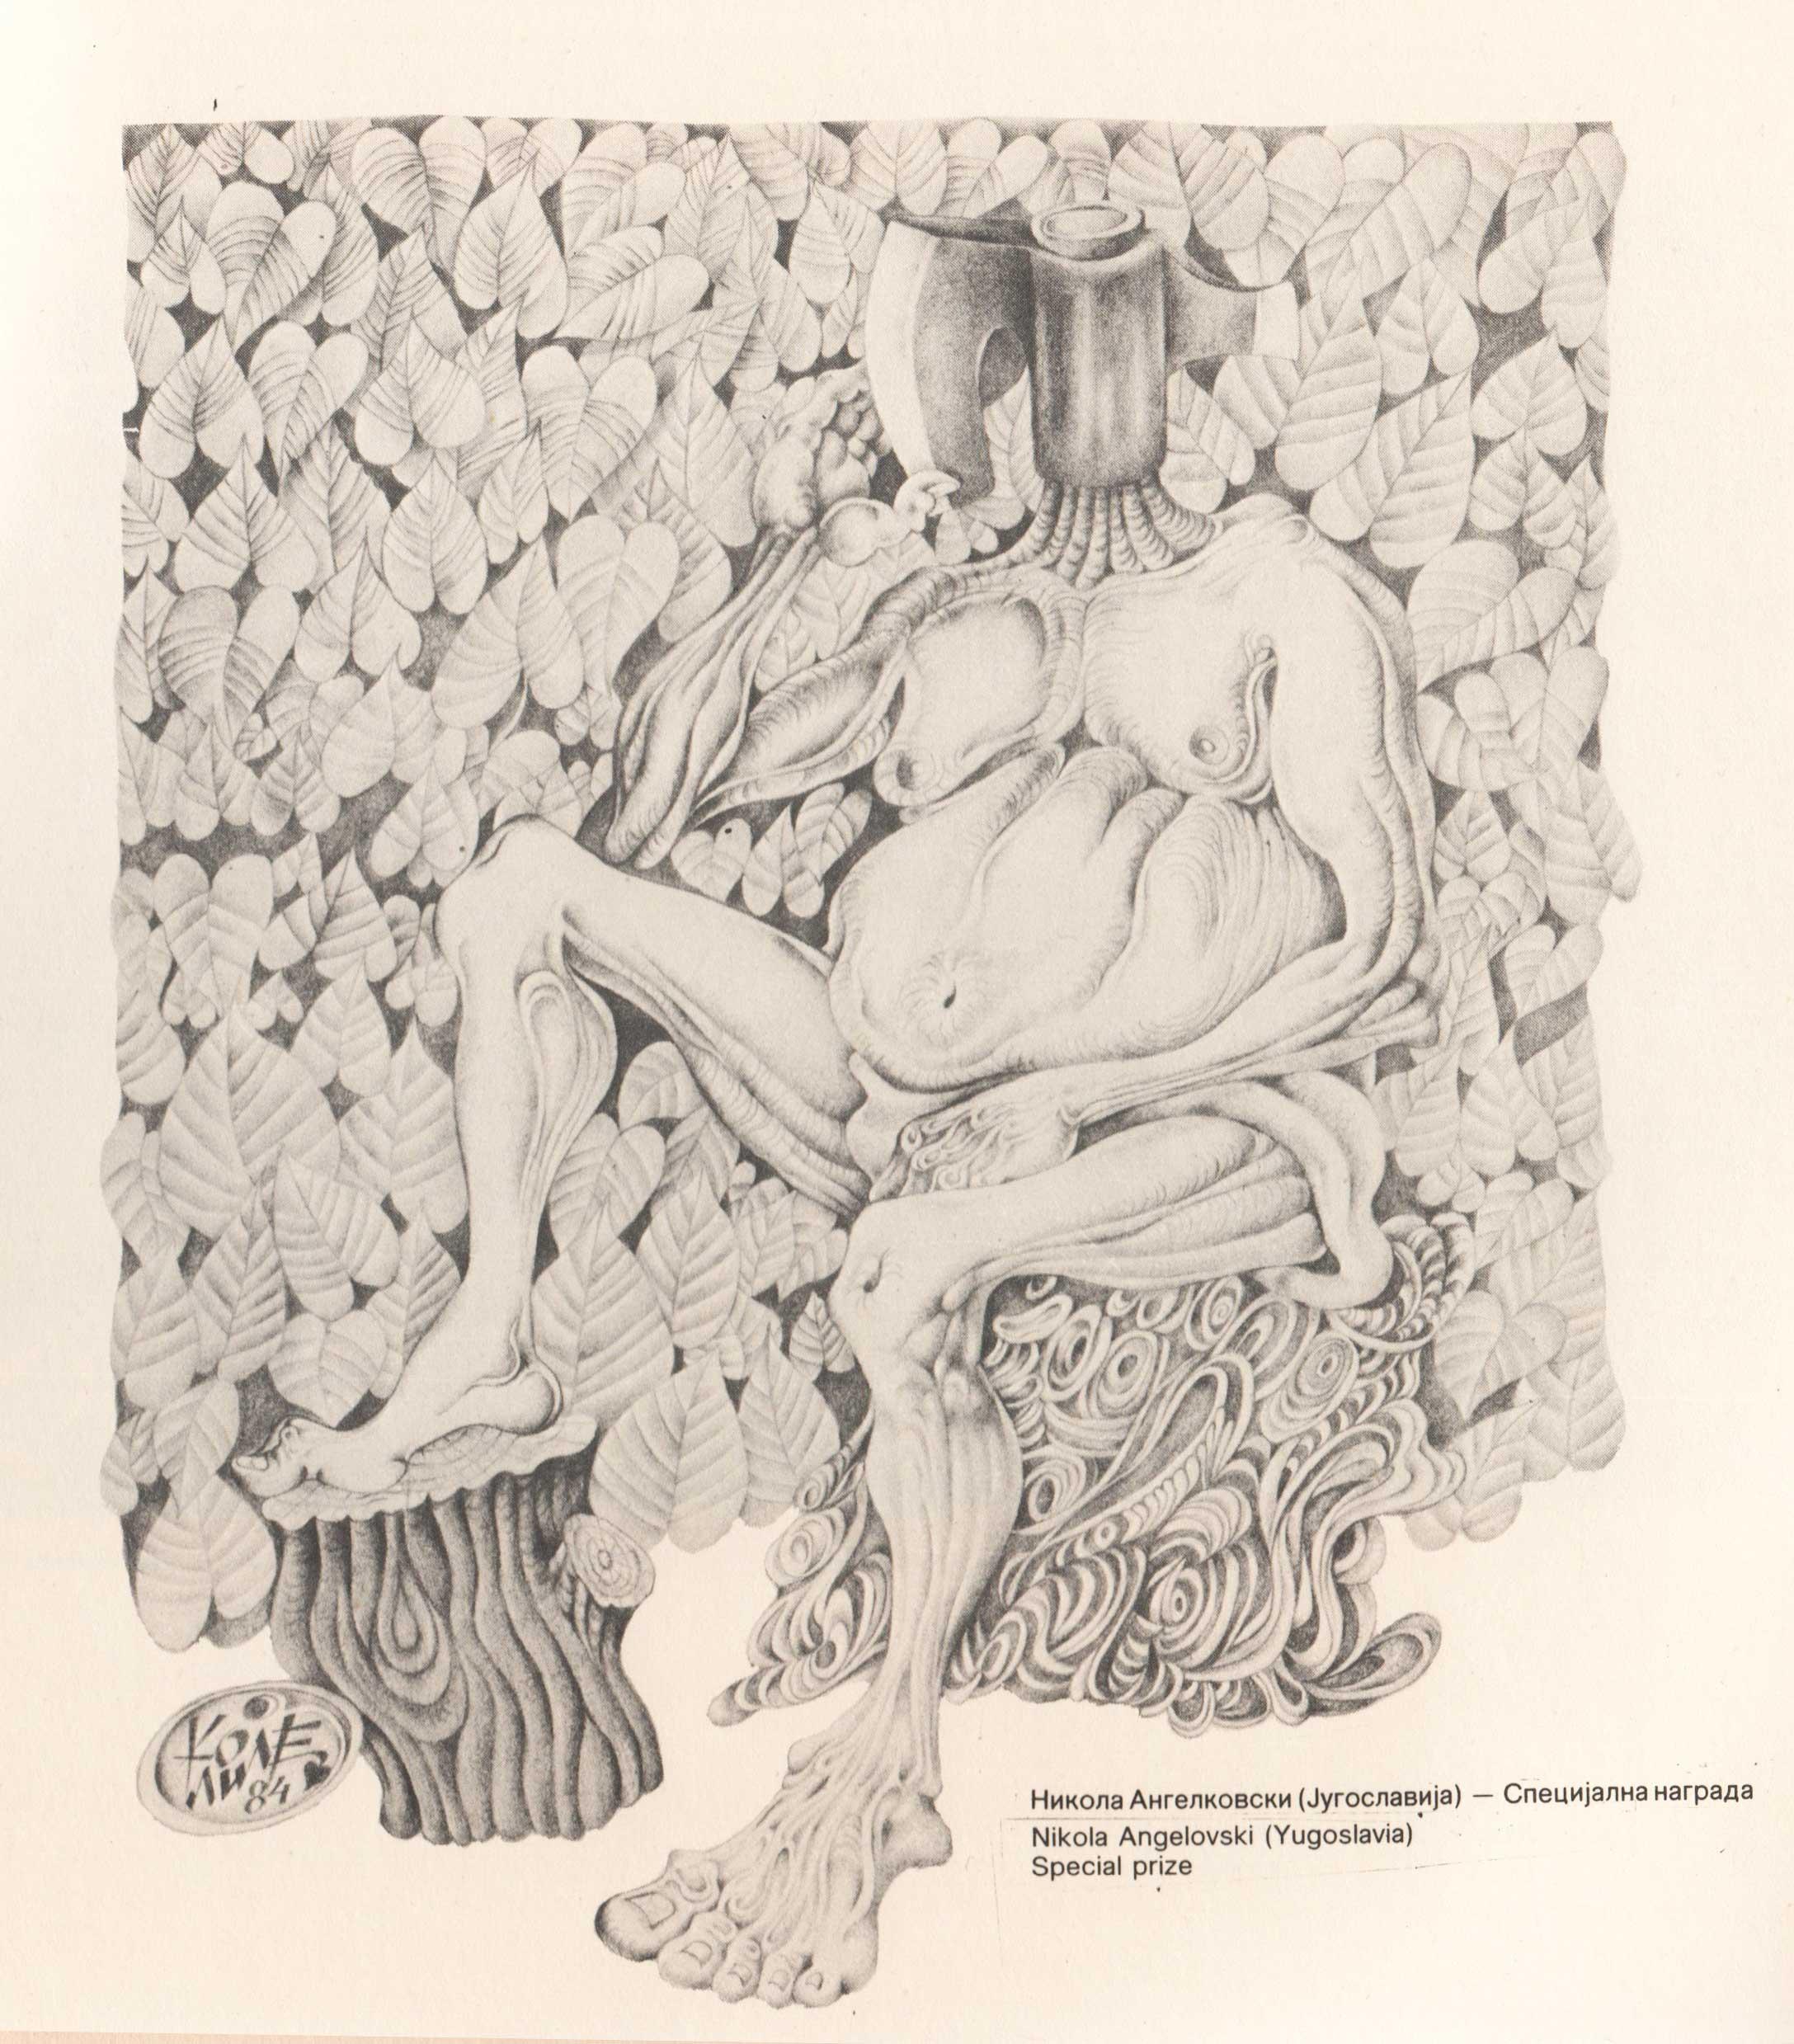 Special Prize, Nikola ANGELKOVSKI (Yugoslavia)